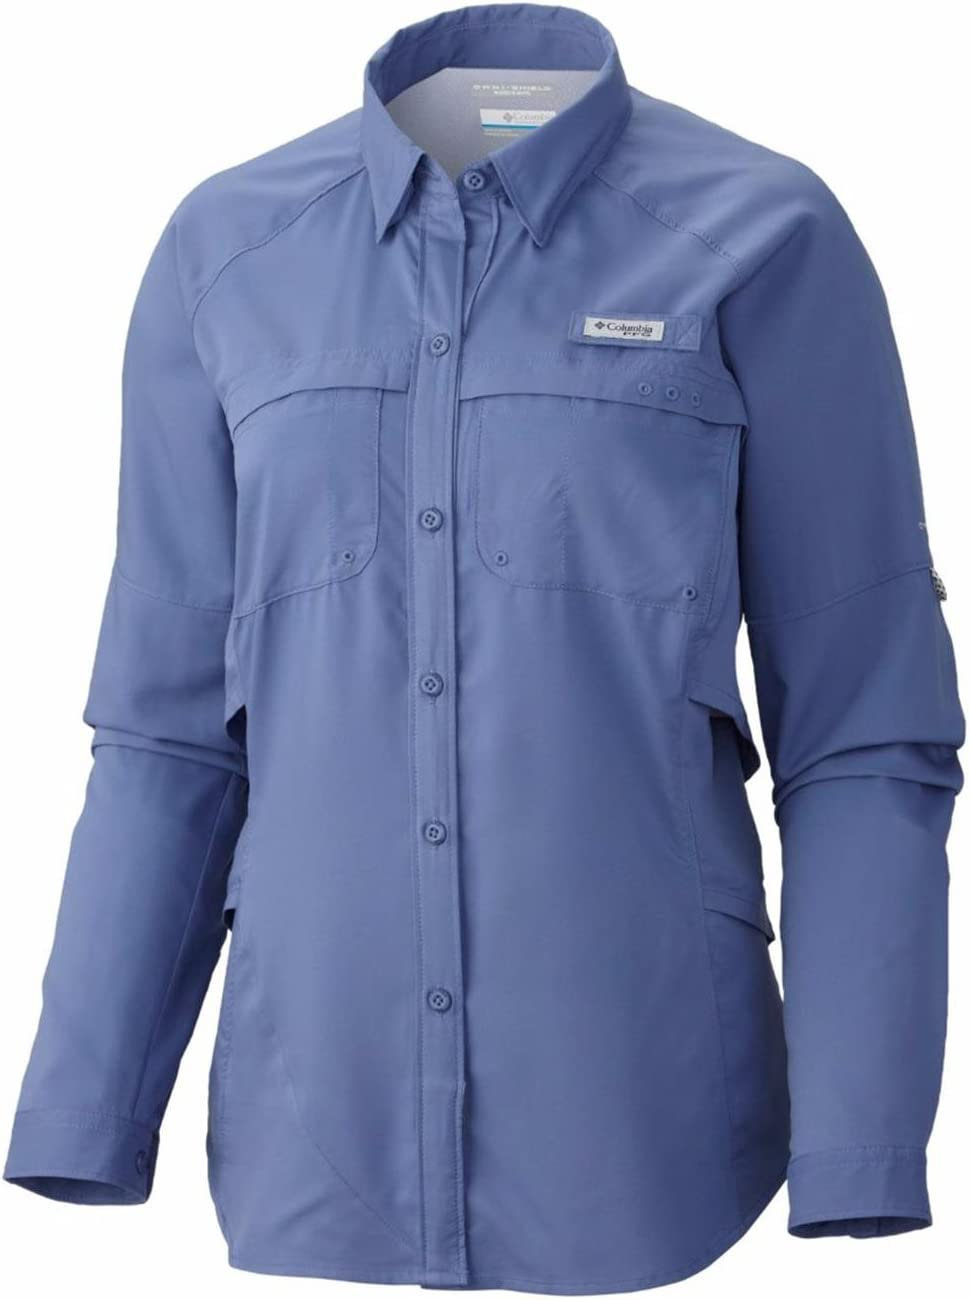 Columbia Airgal Camisa de Manga Larga para Mujer, Mujer, Color Bluebell, tamaño Extra-Small: Amazon.es: Deportes y aire libre